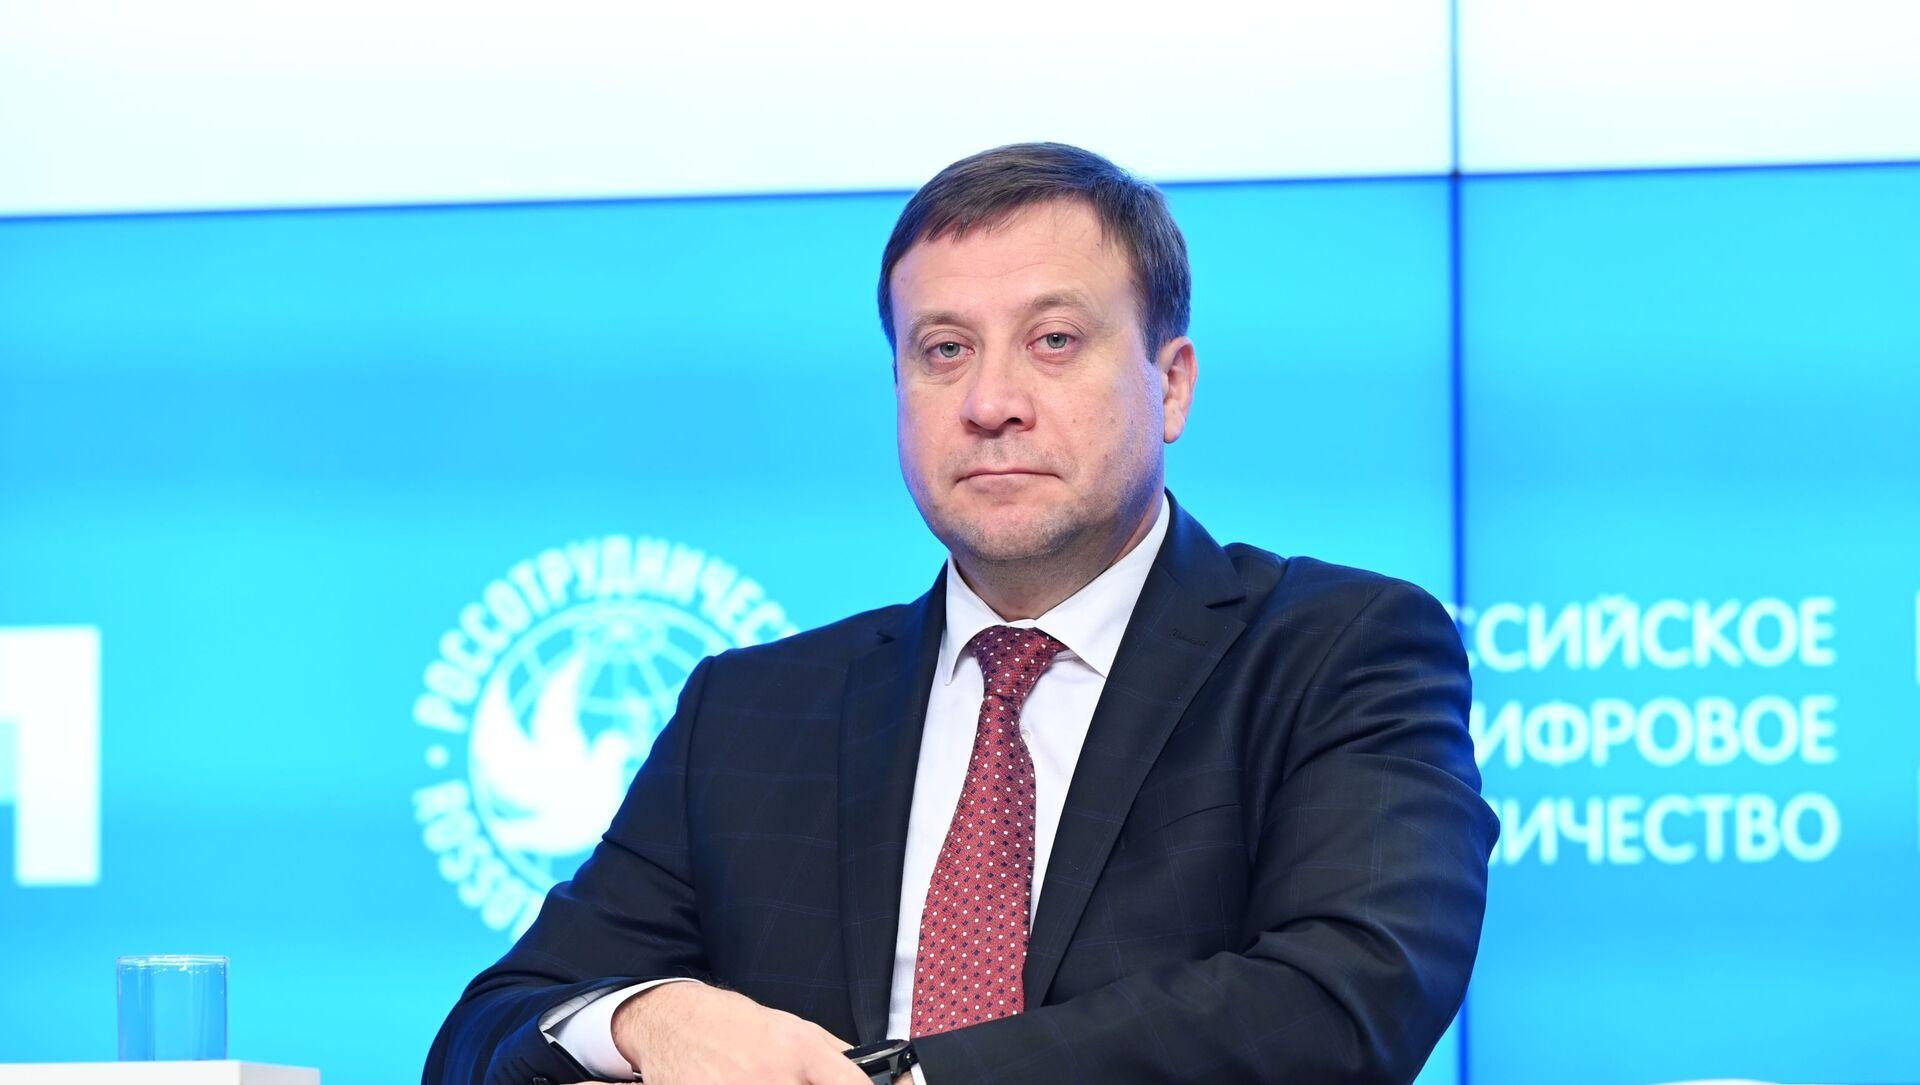 Rossotrudniçestvonun rəhbərinin müavini Pavel Şevtsov - Sputnik Азербайджан, 1920, 02.09.2021